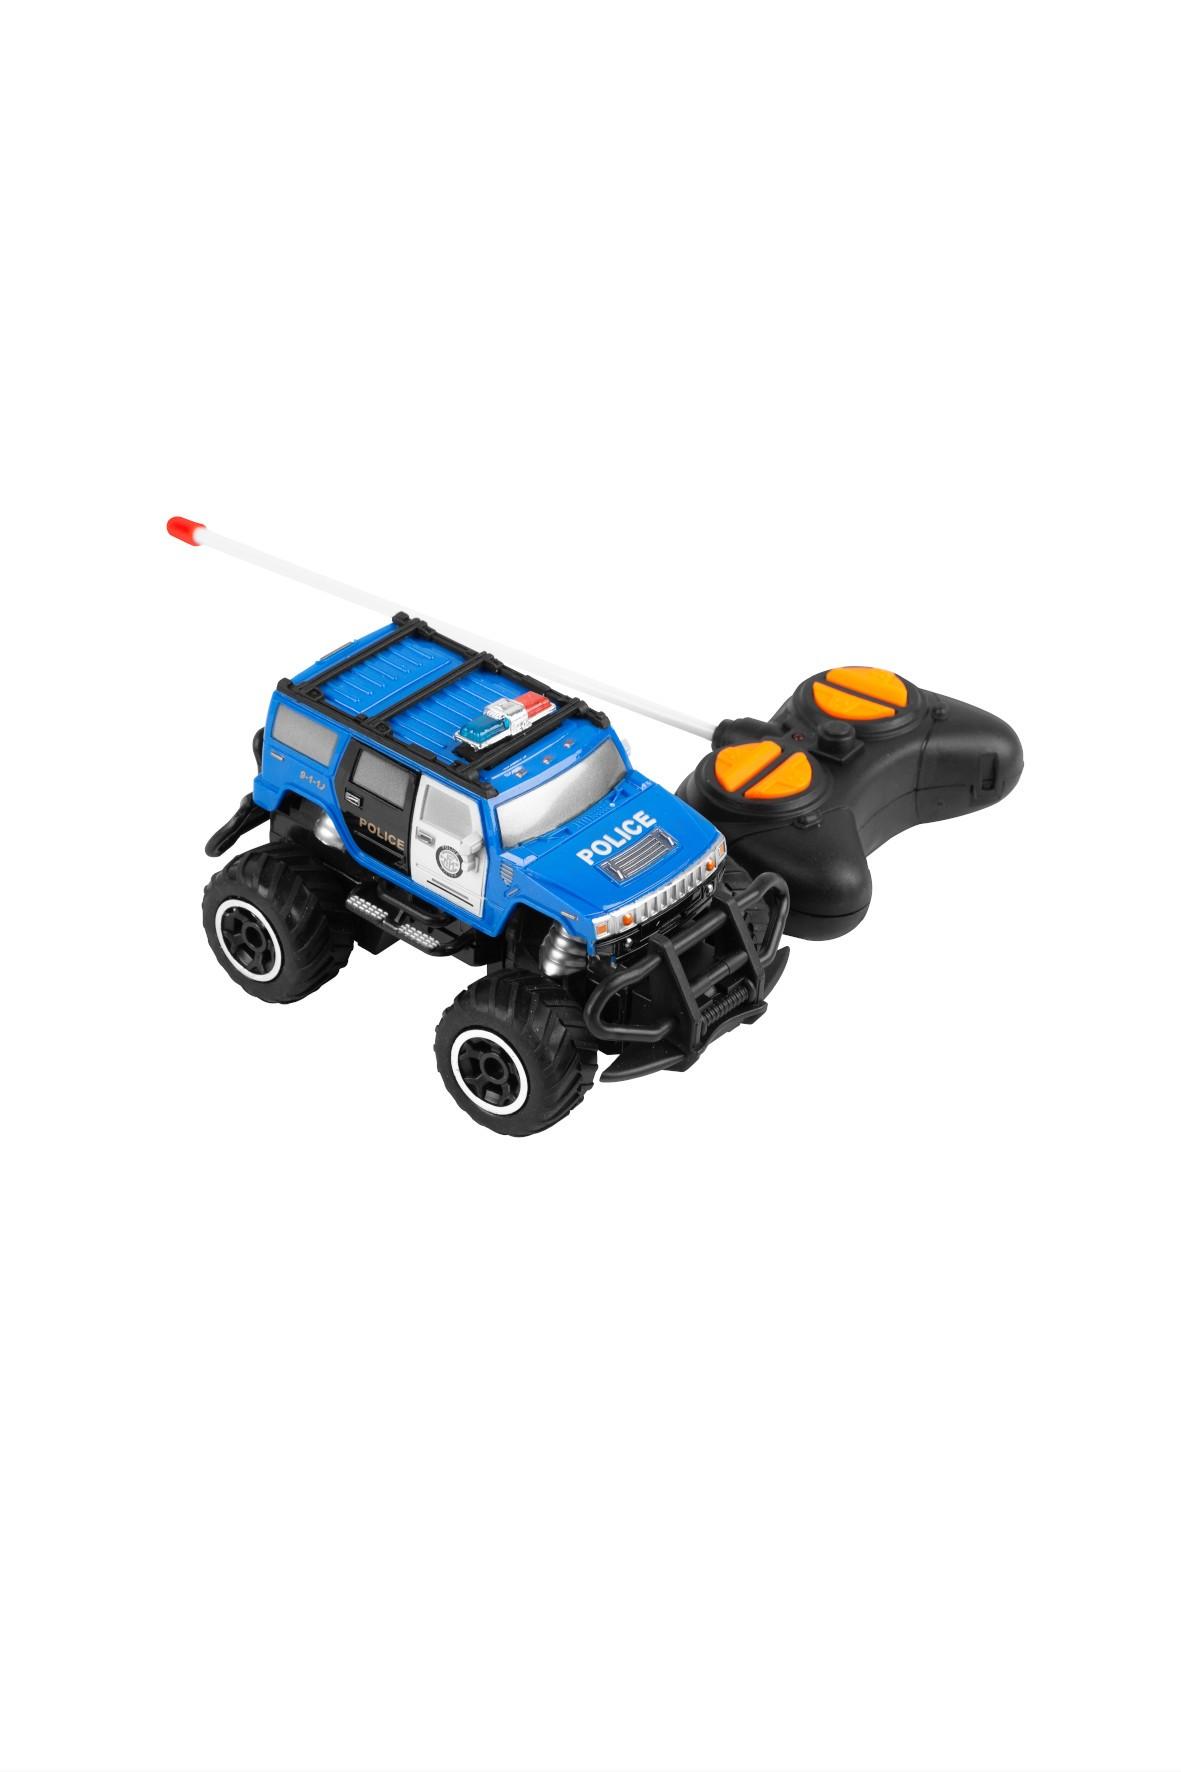 Samochód zdalnie sterowany RC UGO Policja 1:43 10km/h